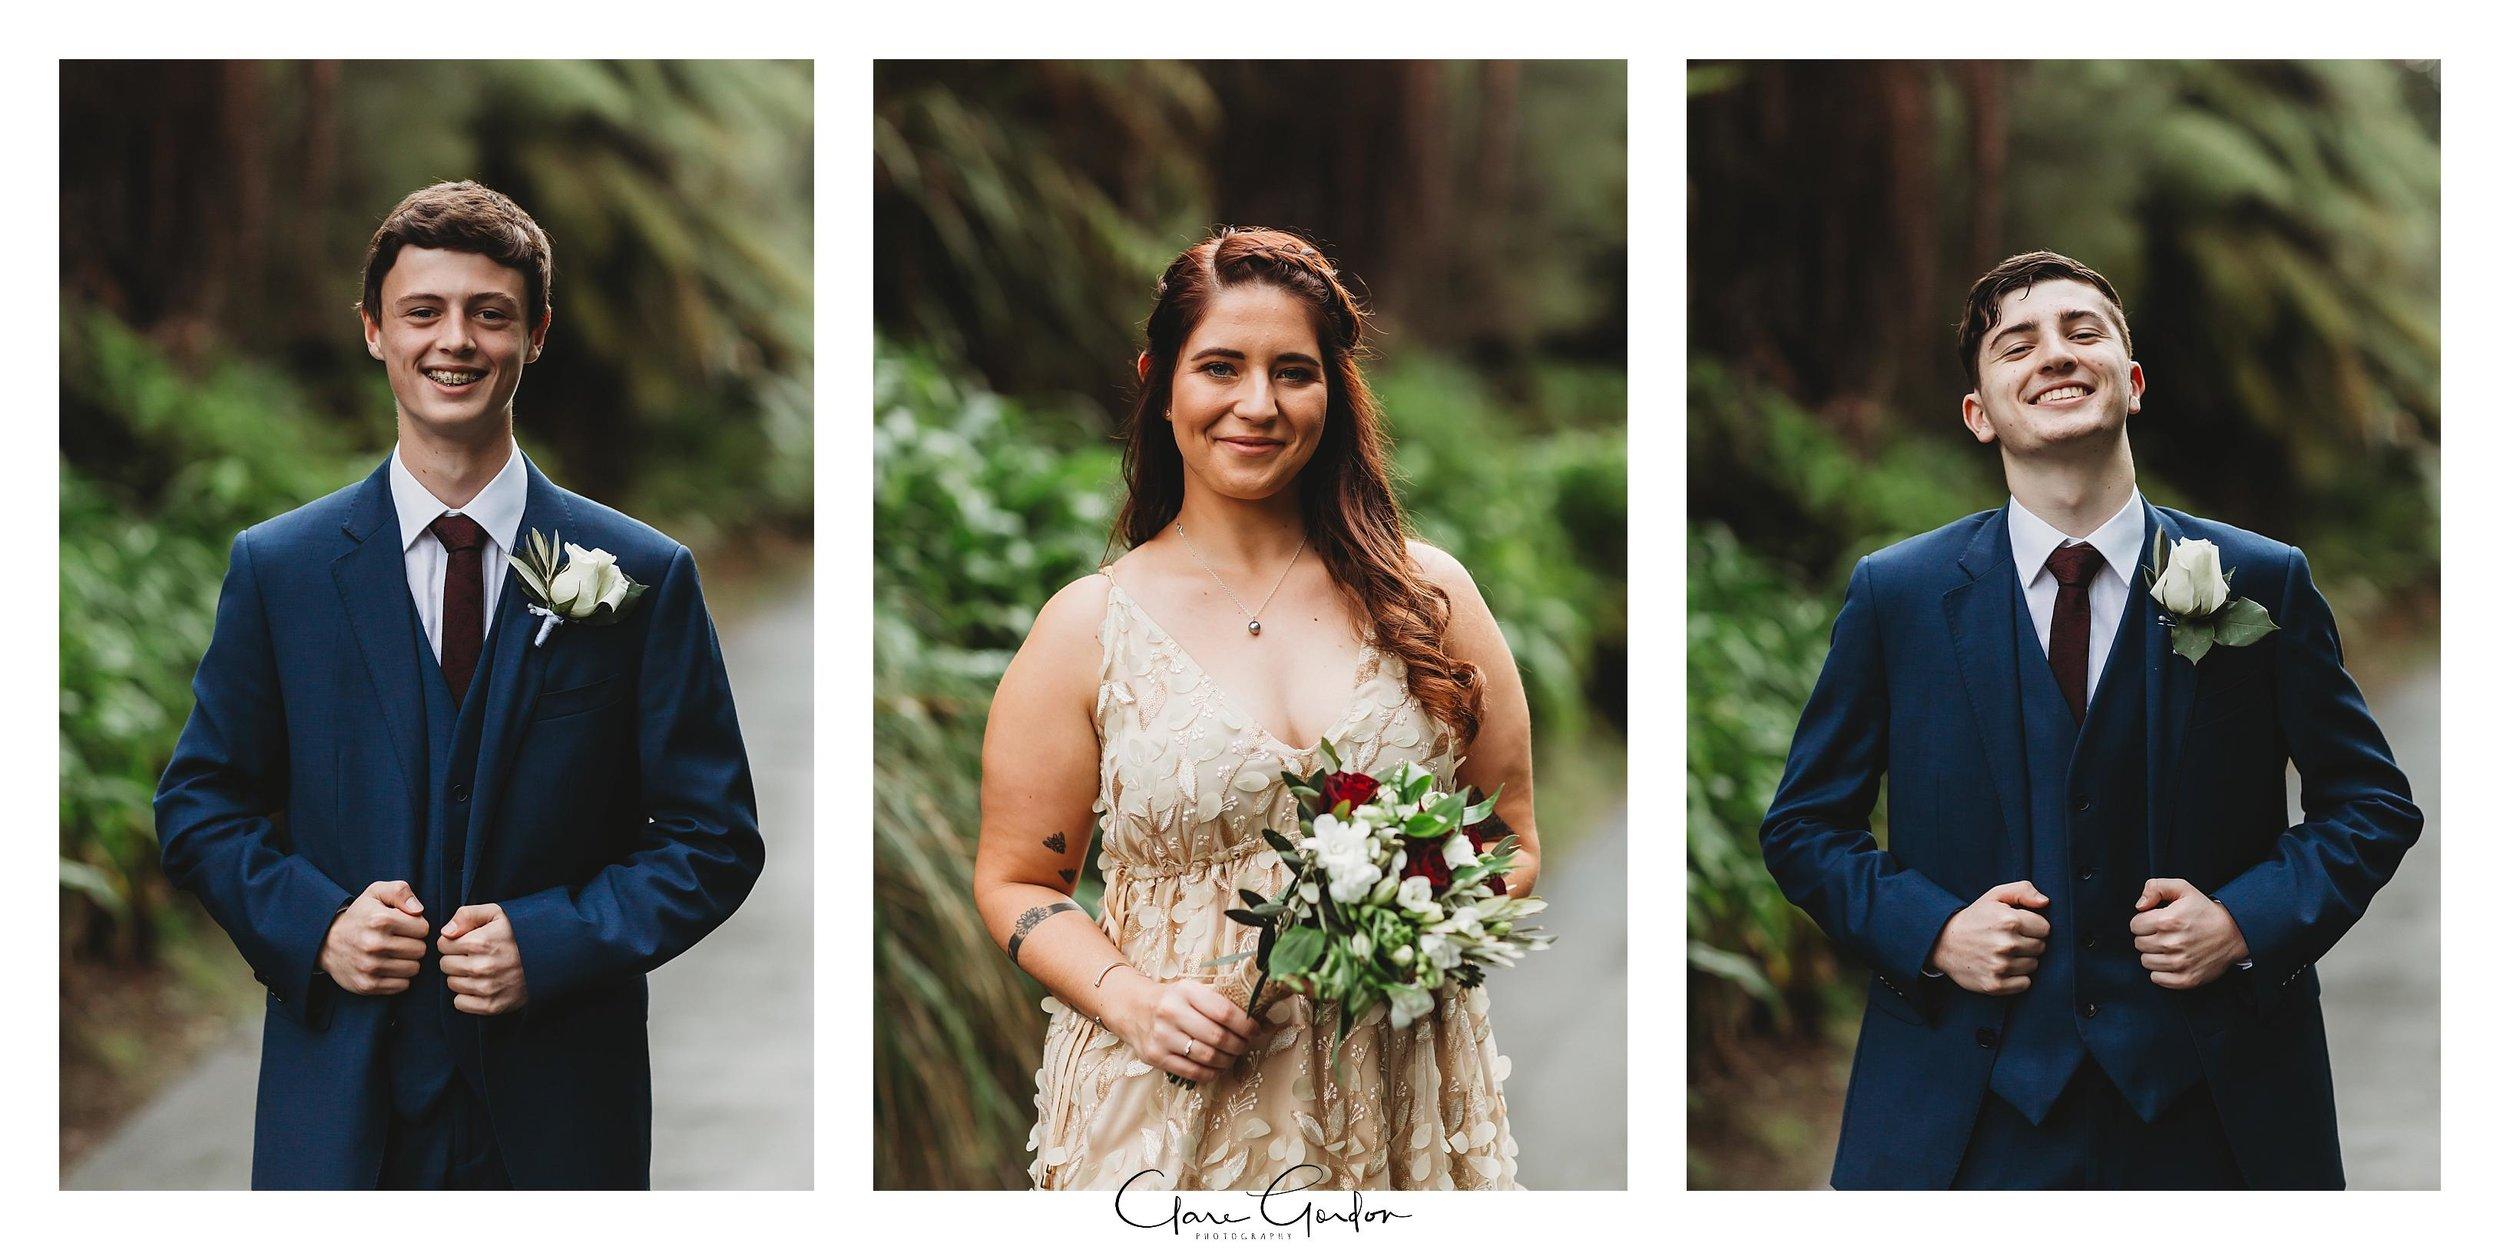 Hamilton-NZ-wedding-photographer-Bride-reflection-Waikato-wedding-photographer-Novotel-Hamilton-Clare-Gordon-photography (26).jpg